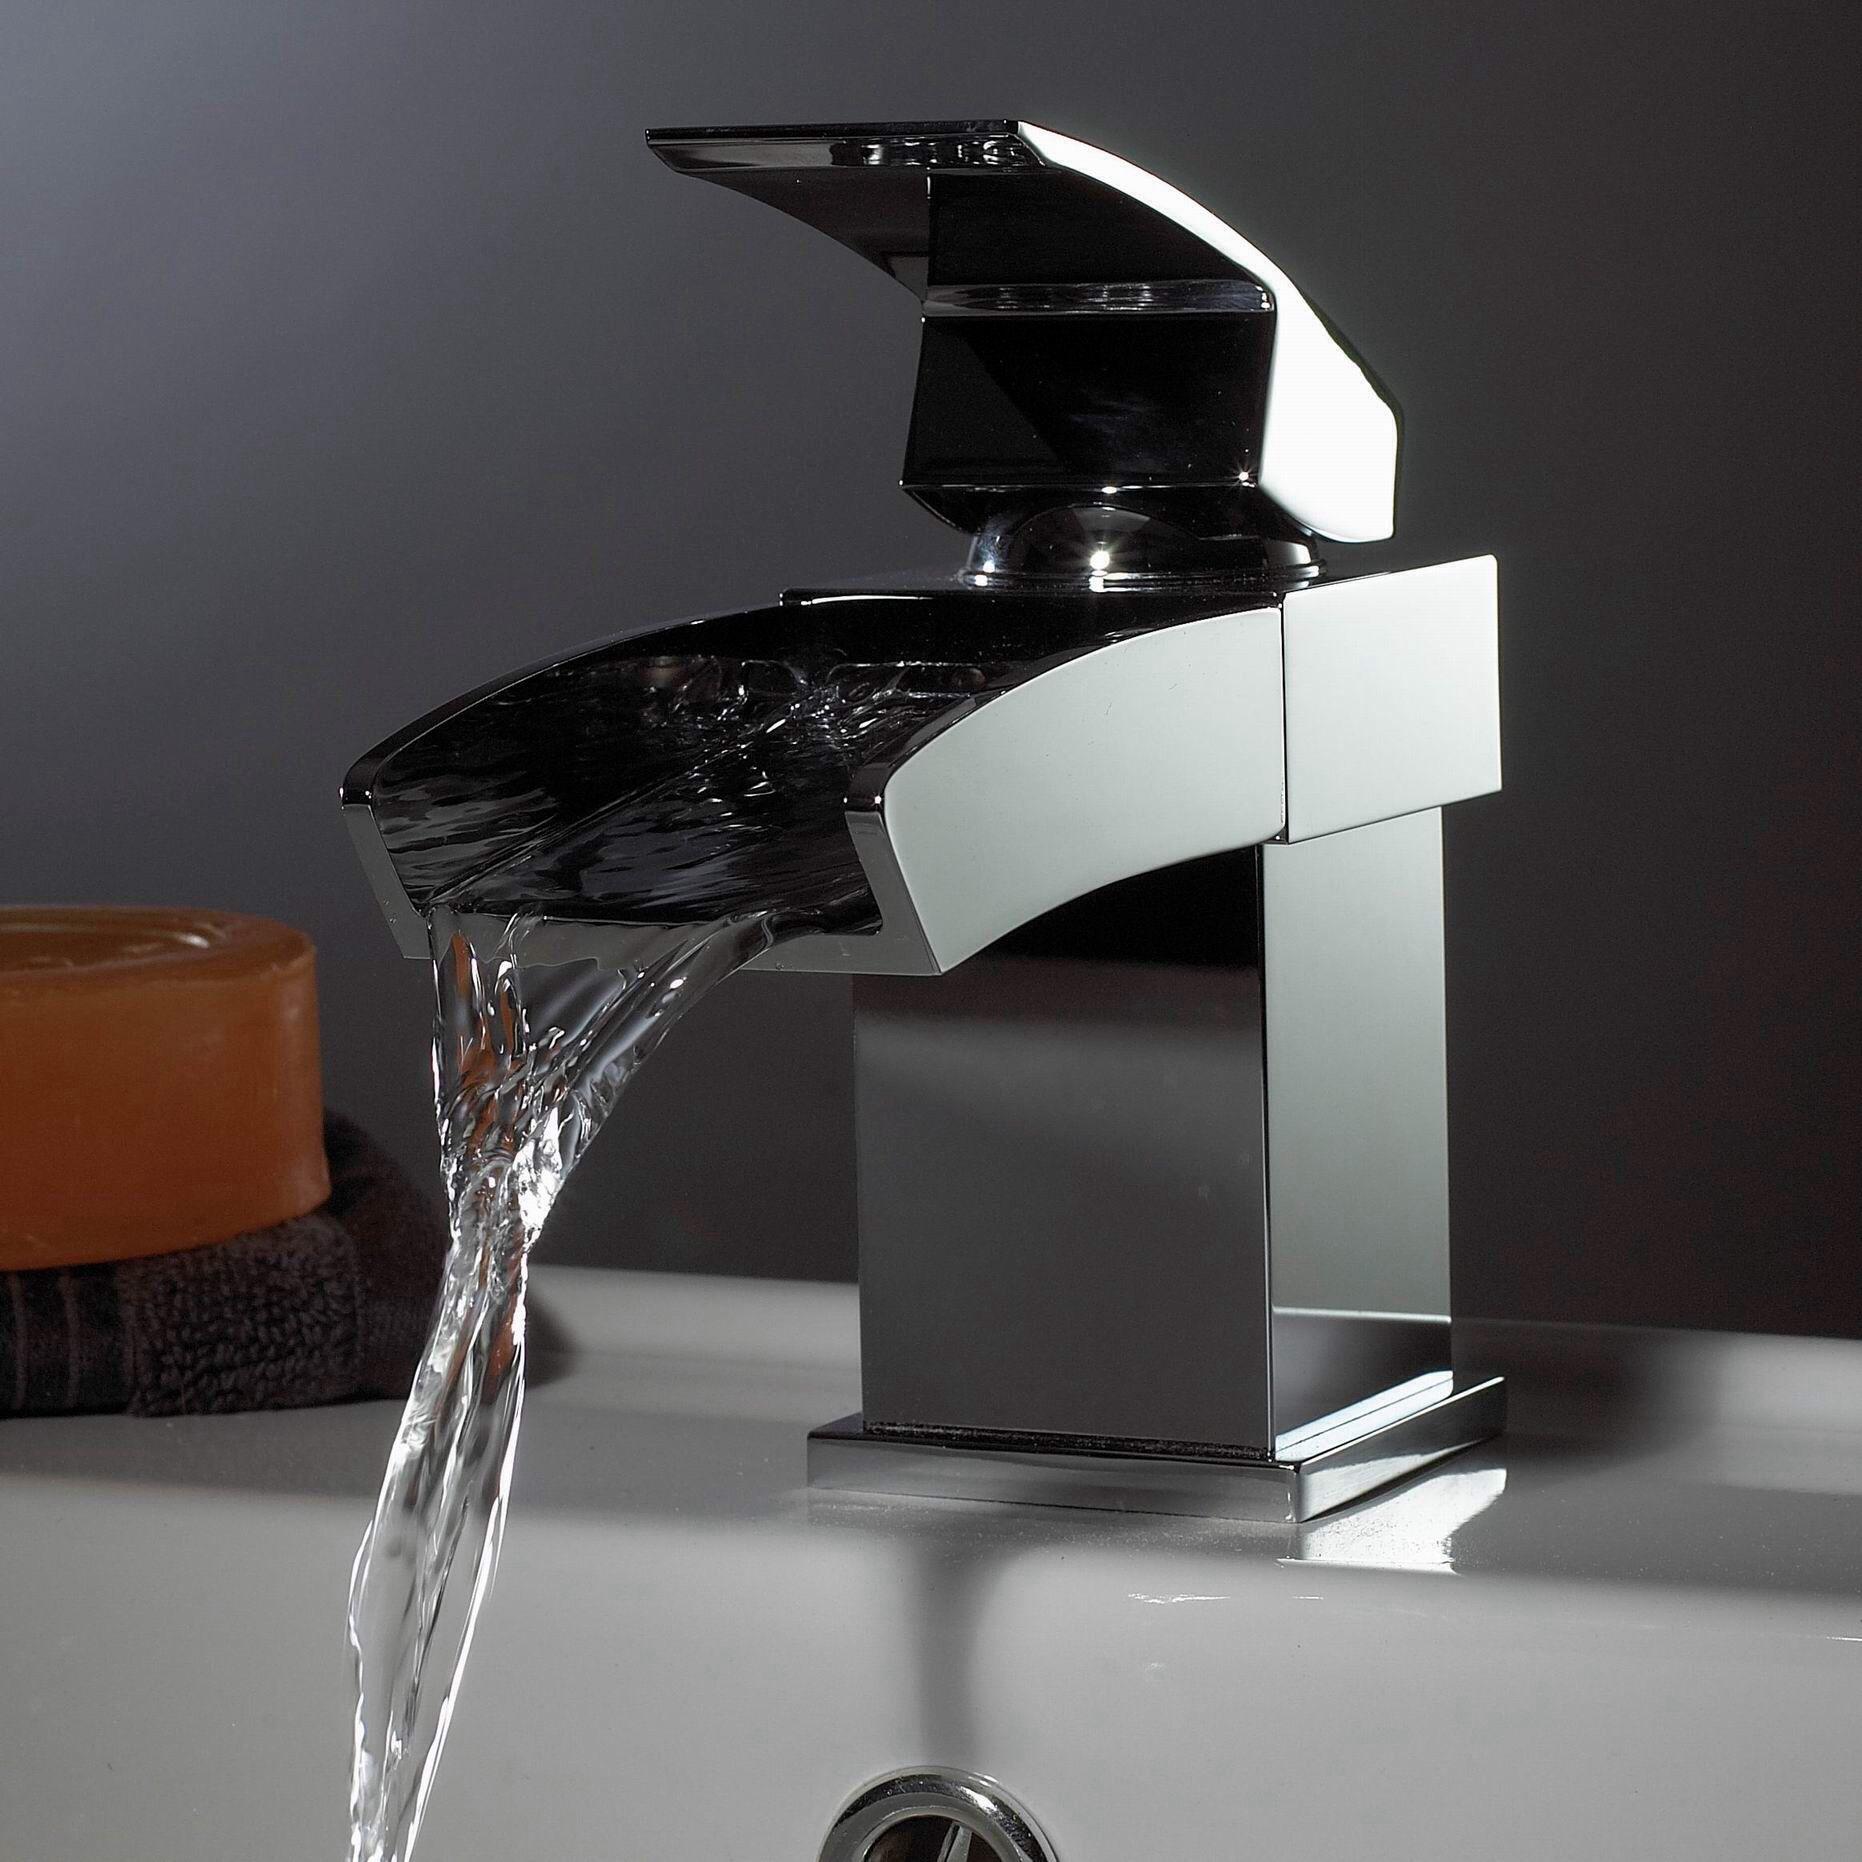 Basin taps | Bathroom | Pinterest | Basin taps and Basin